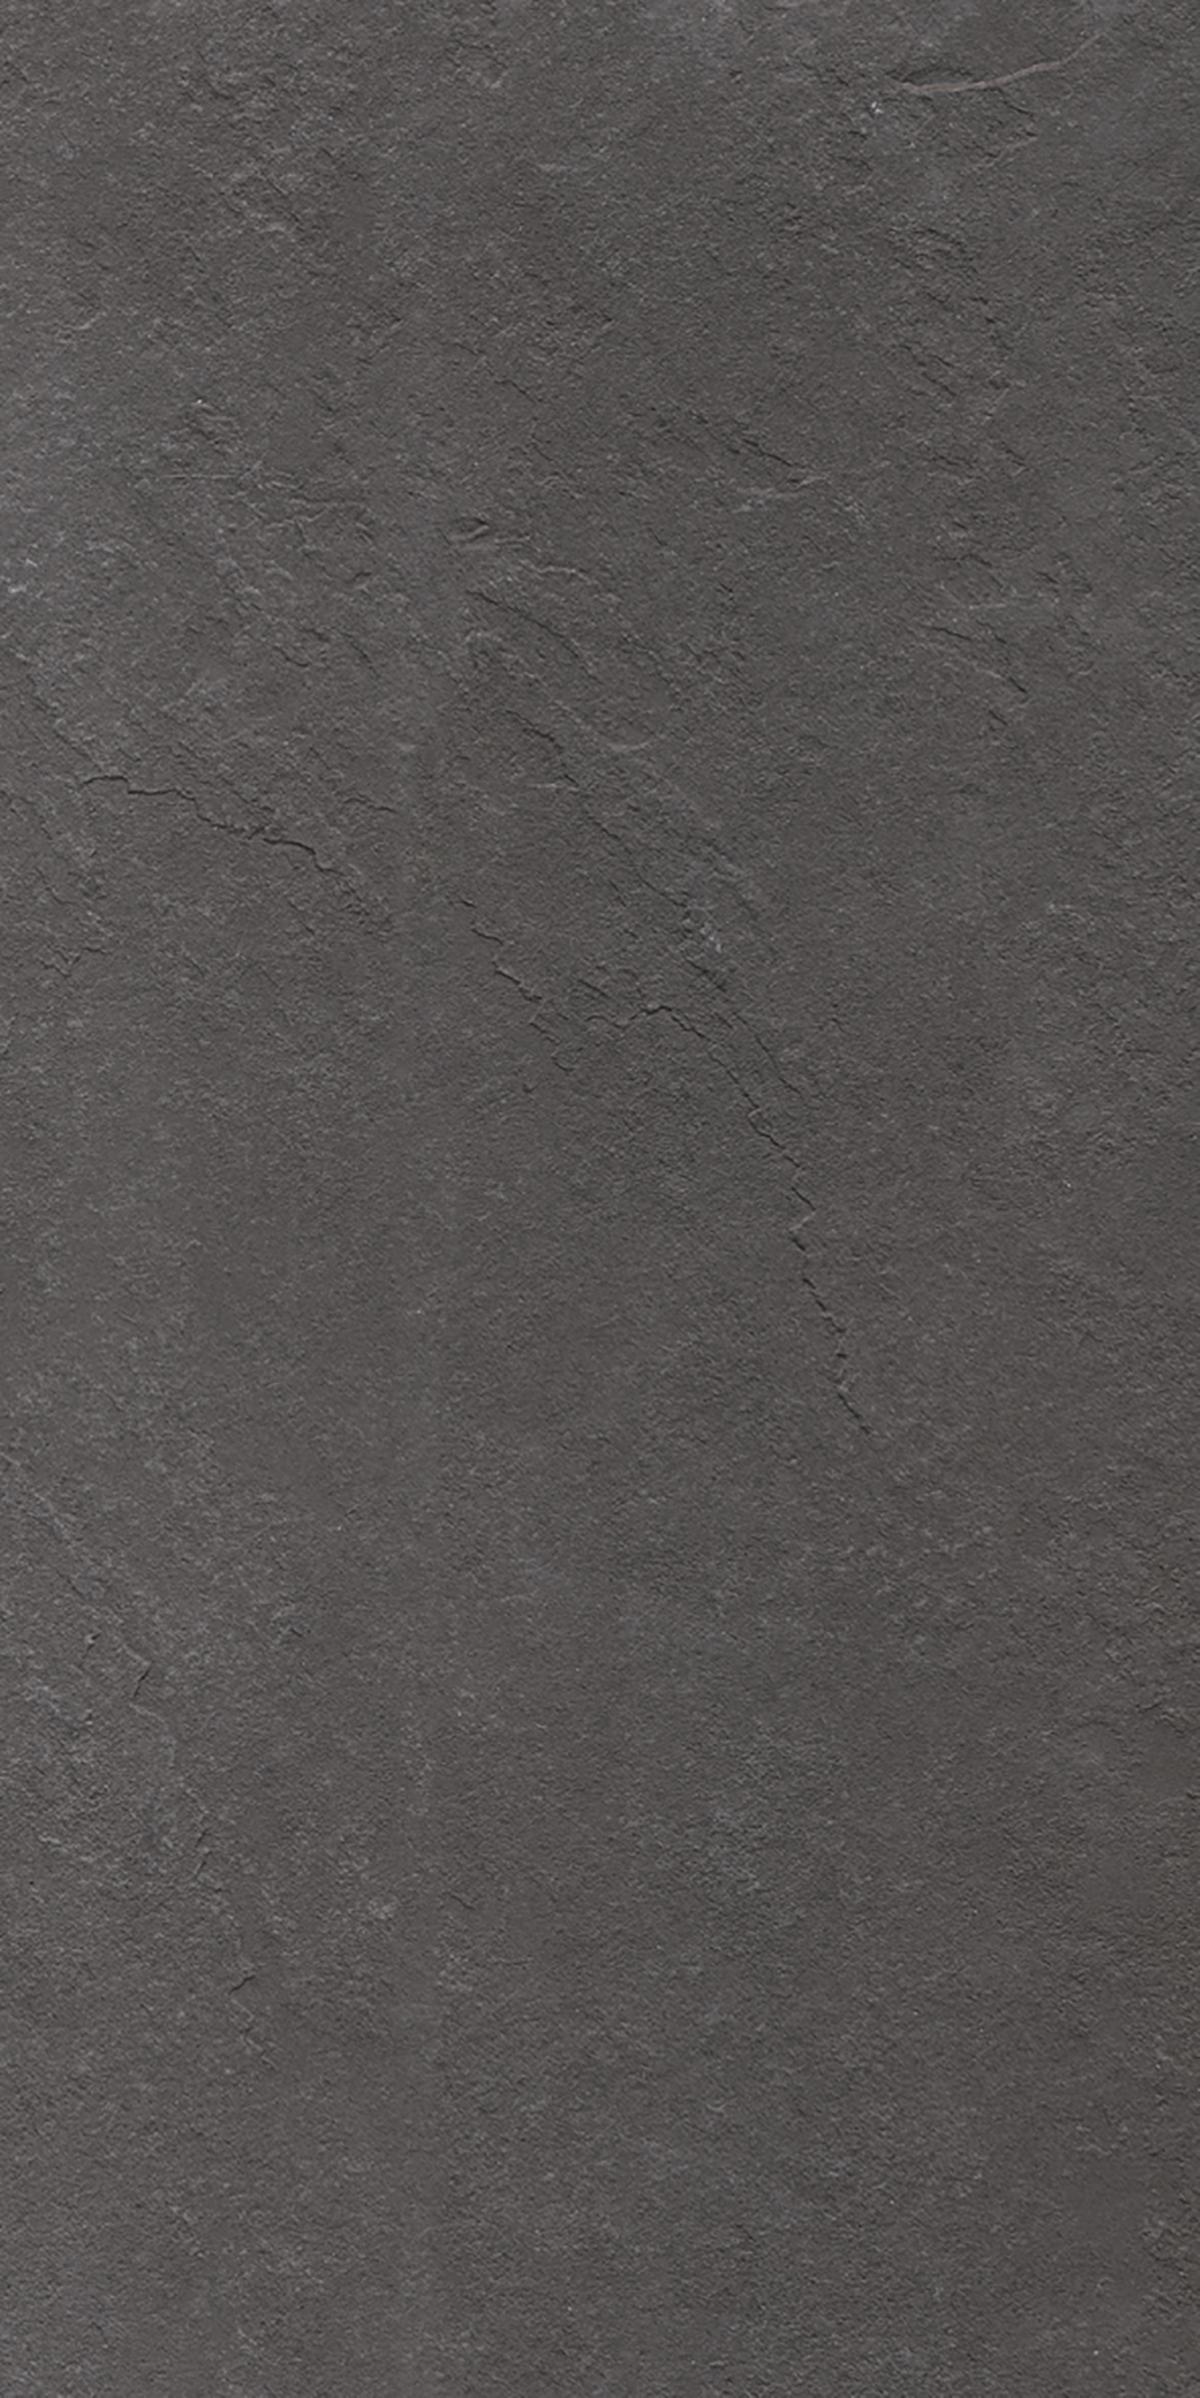 Plaza Natural Slate 29.8x60 zwarte vloertegel